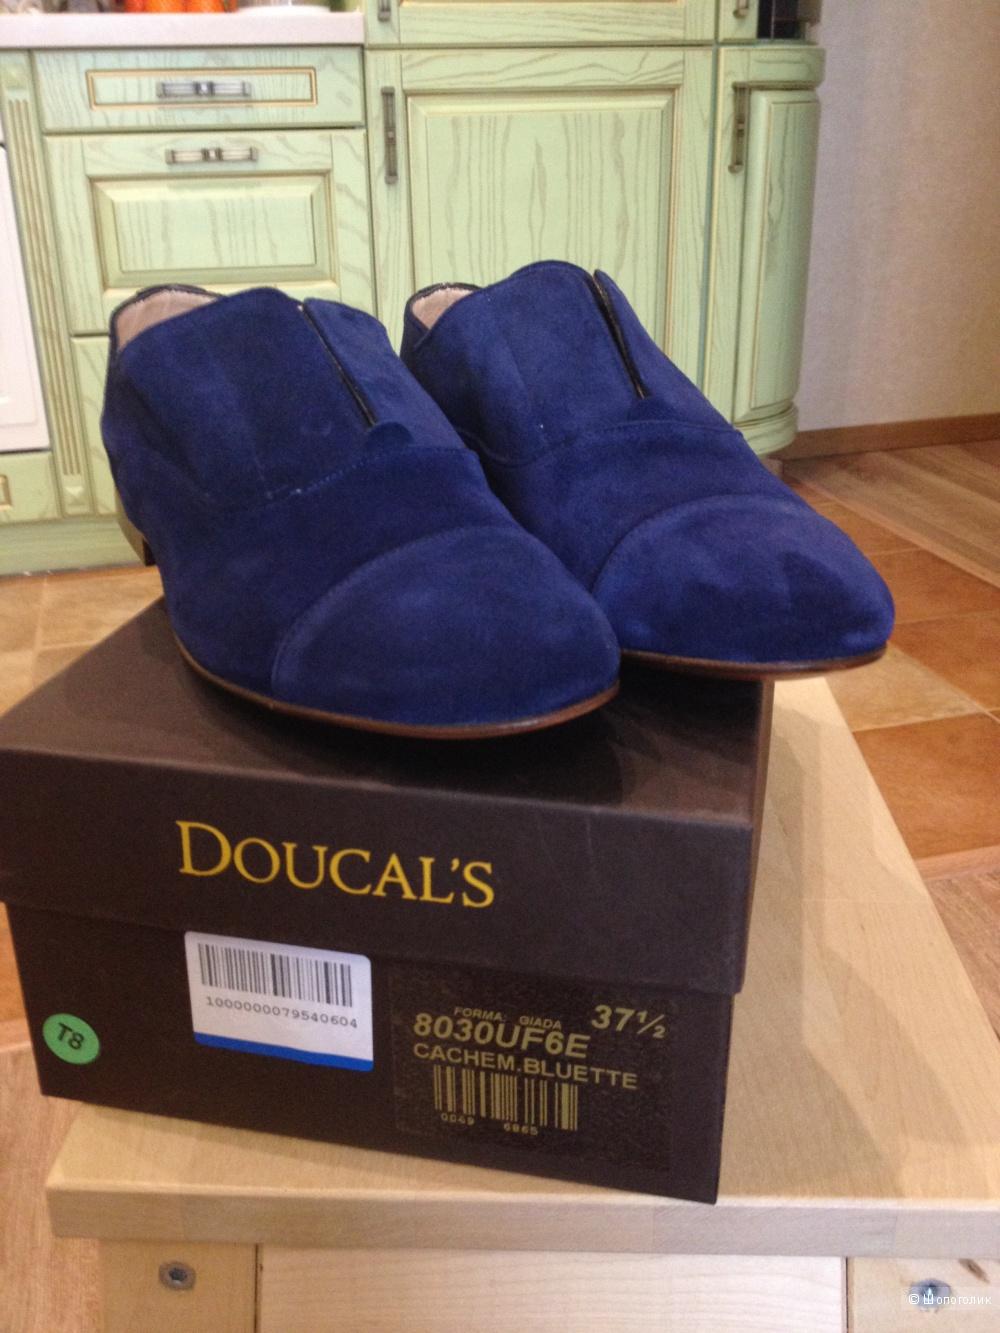 Мокасины DOUCAL'S, натуральная замша, 37,5 размер, новые с биркой